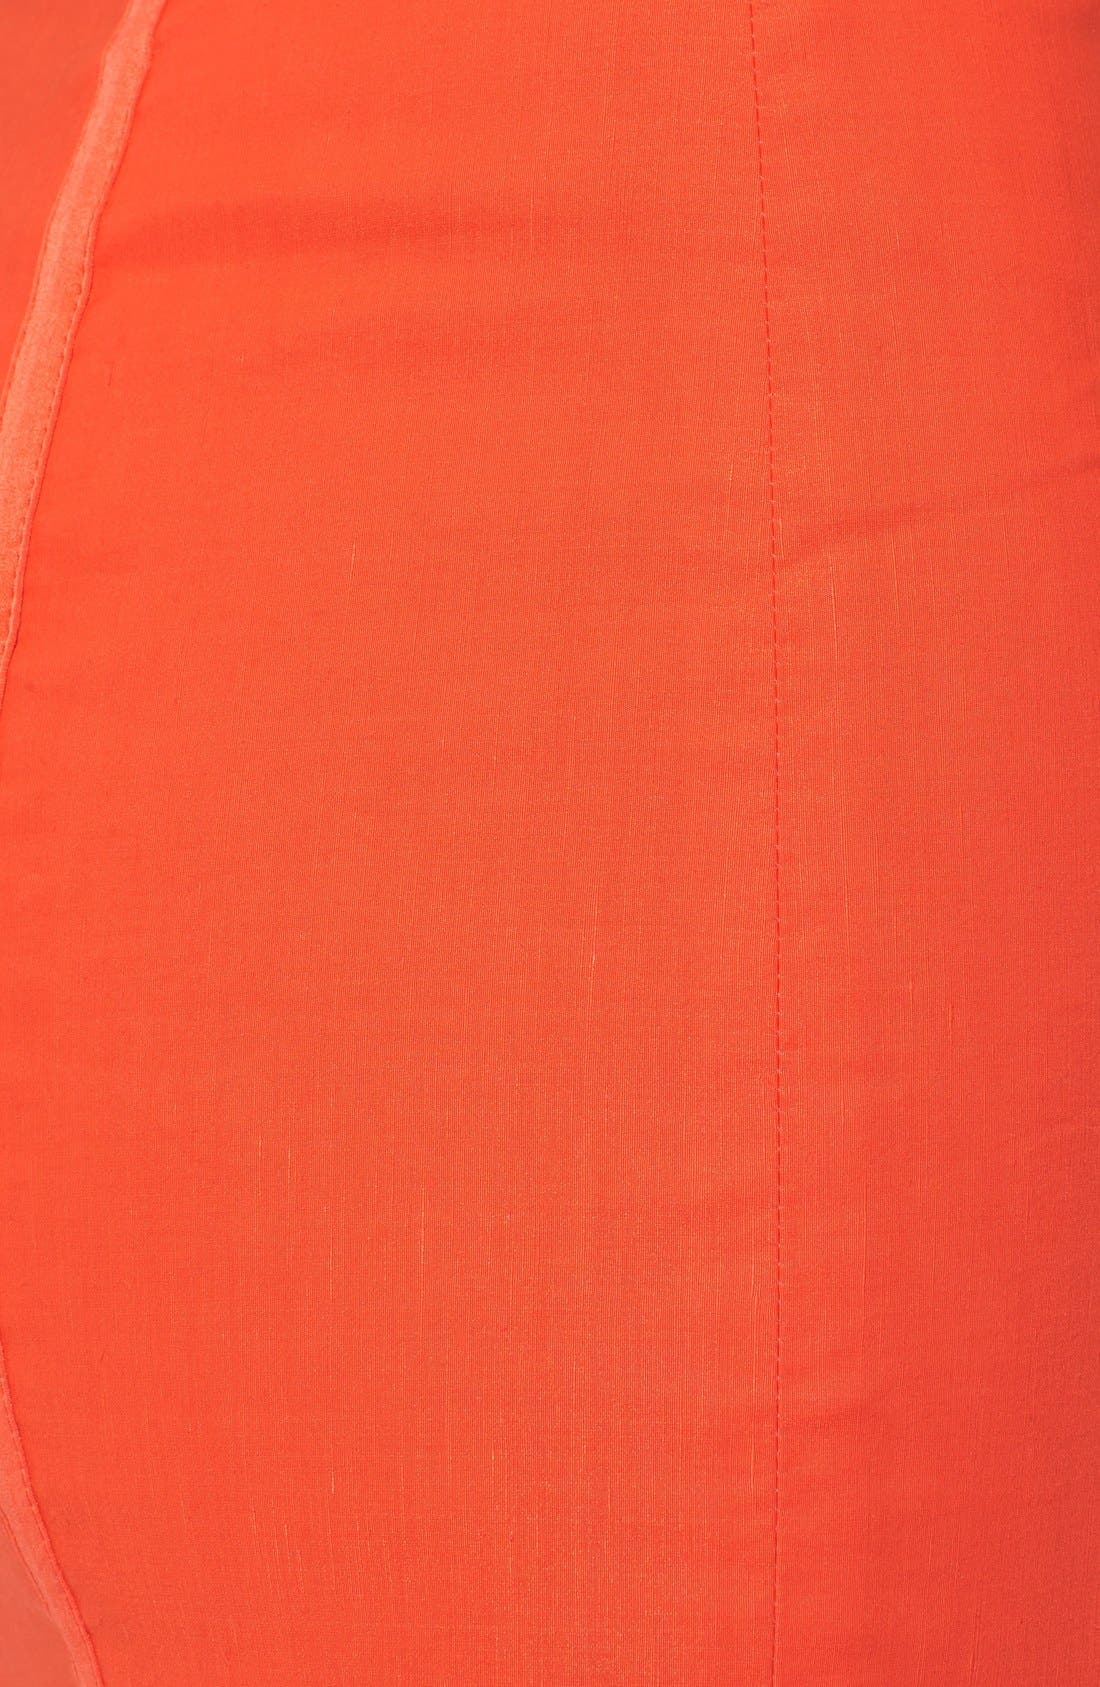 'Maui' Strapless Bustier Dress,                             Alternate thumbnail 3, color,                             606